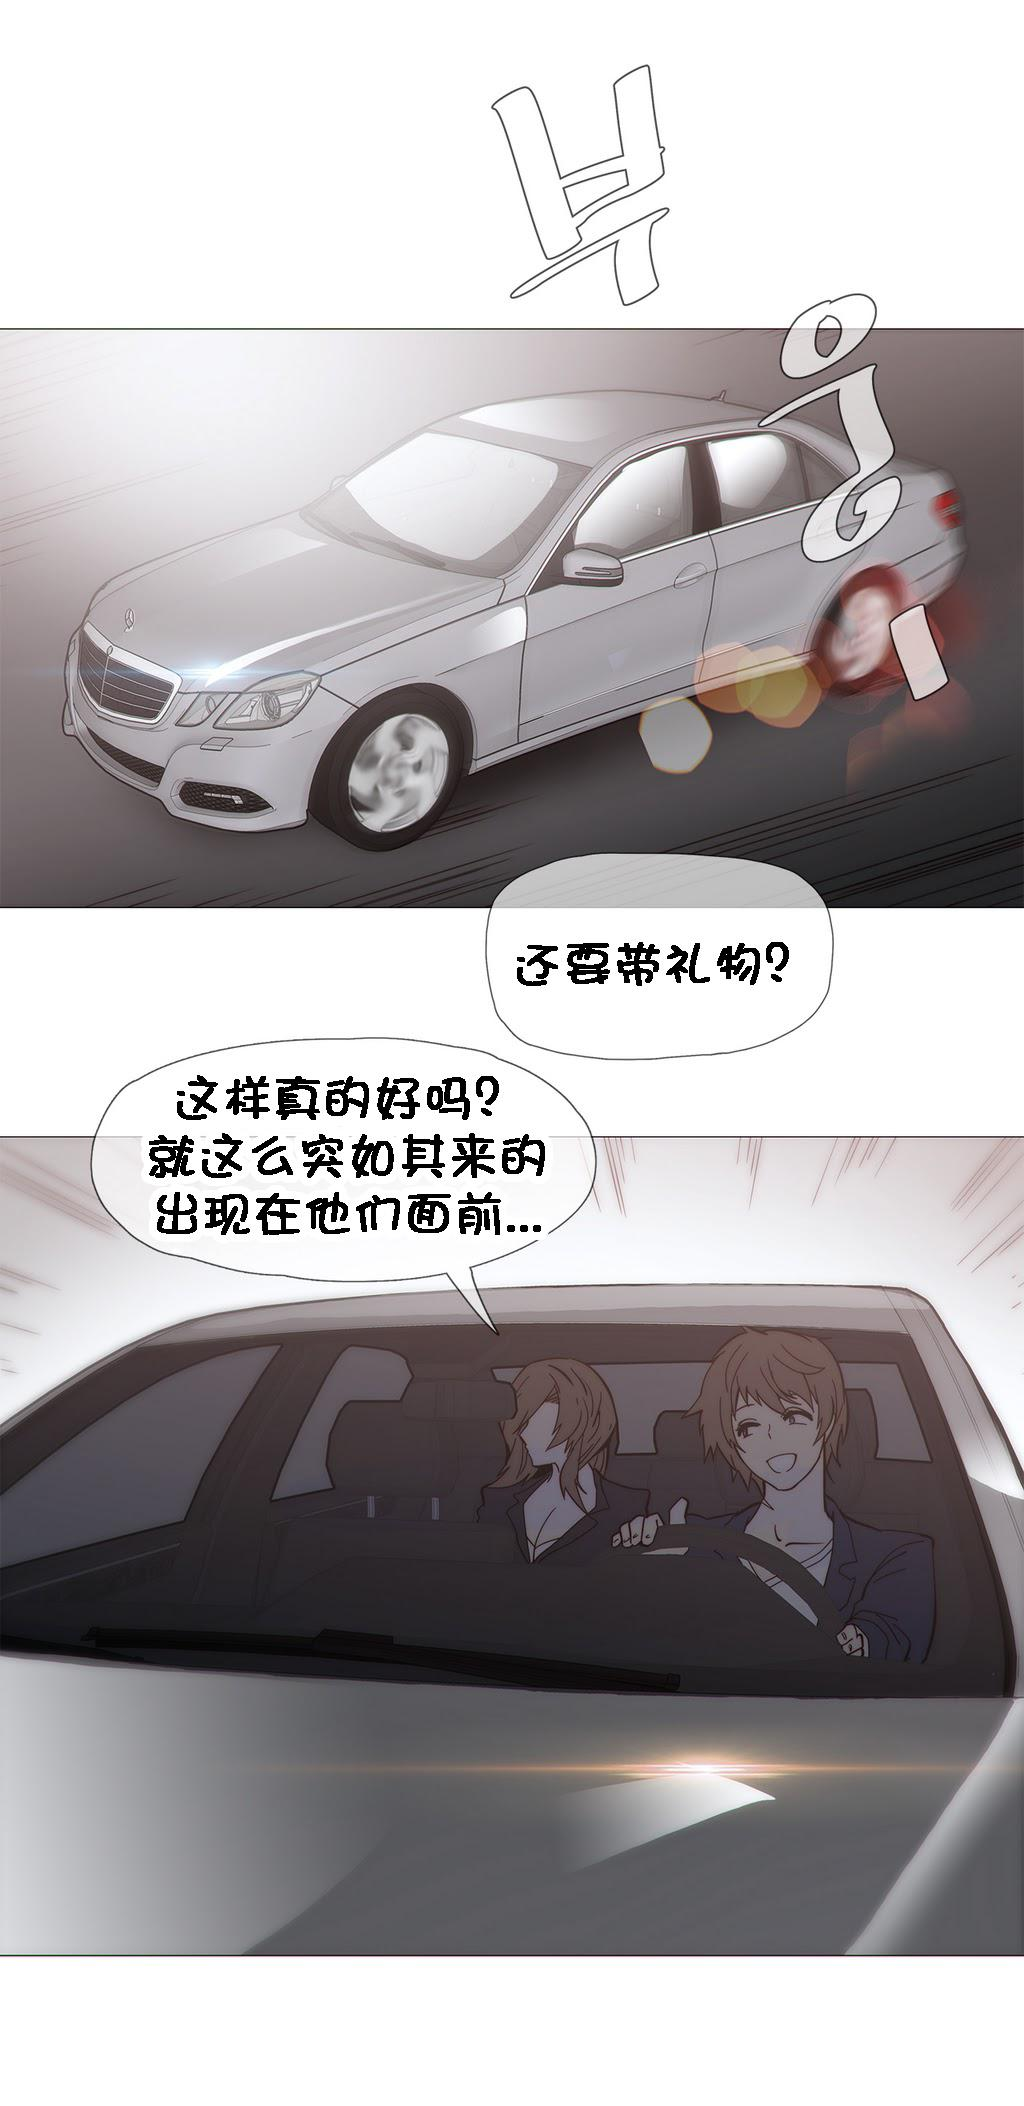 HouseHold Affairs 【卞赤鲤个人汉化】1~33话(持续更新中) 614